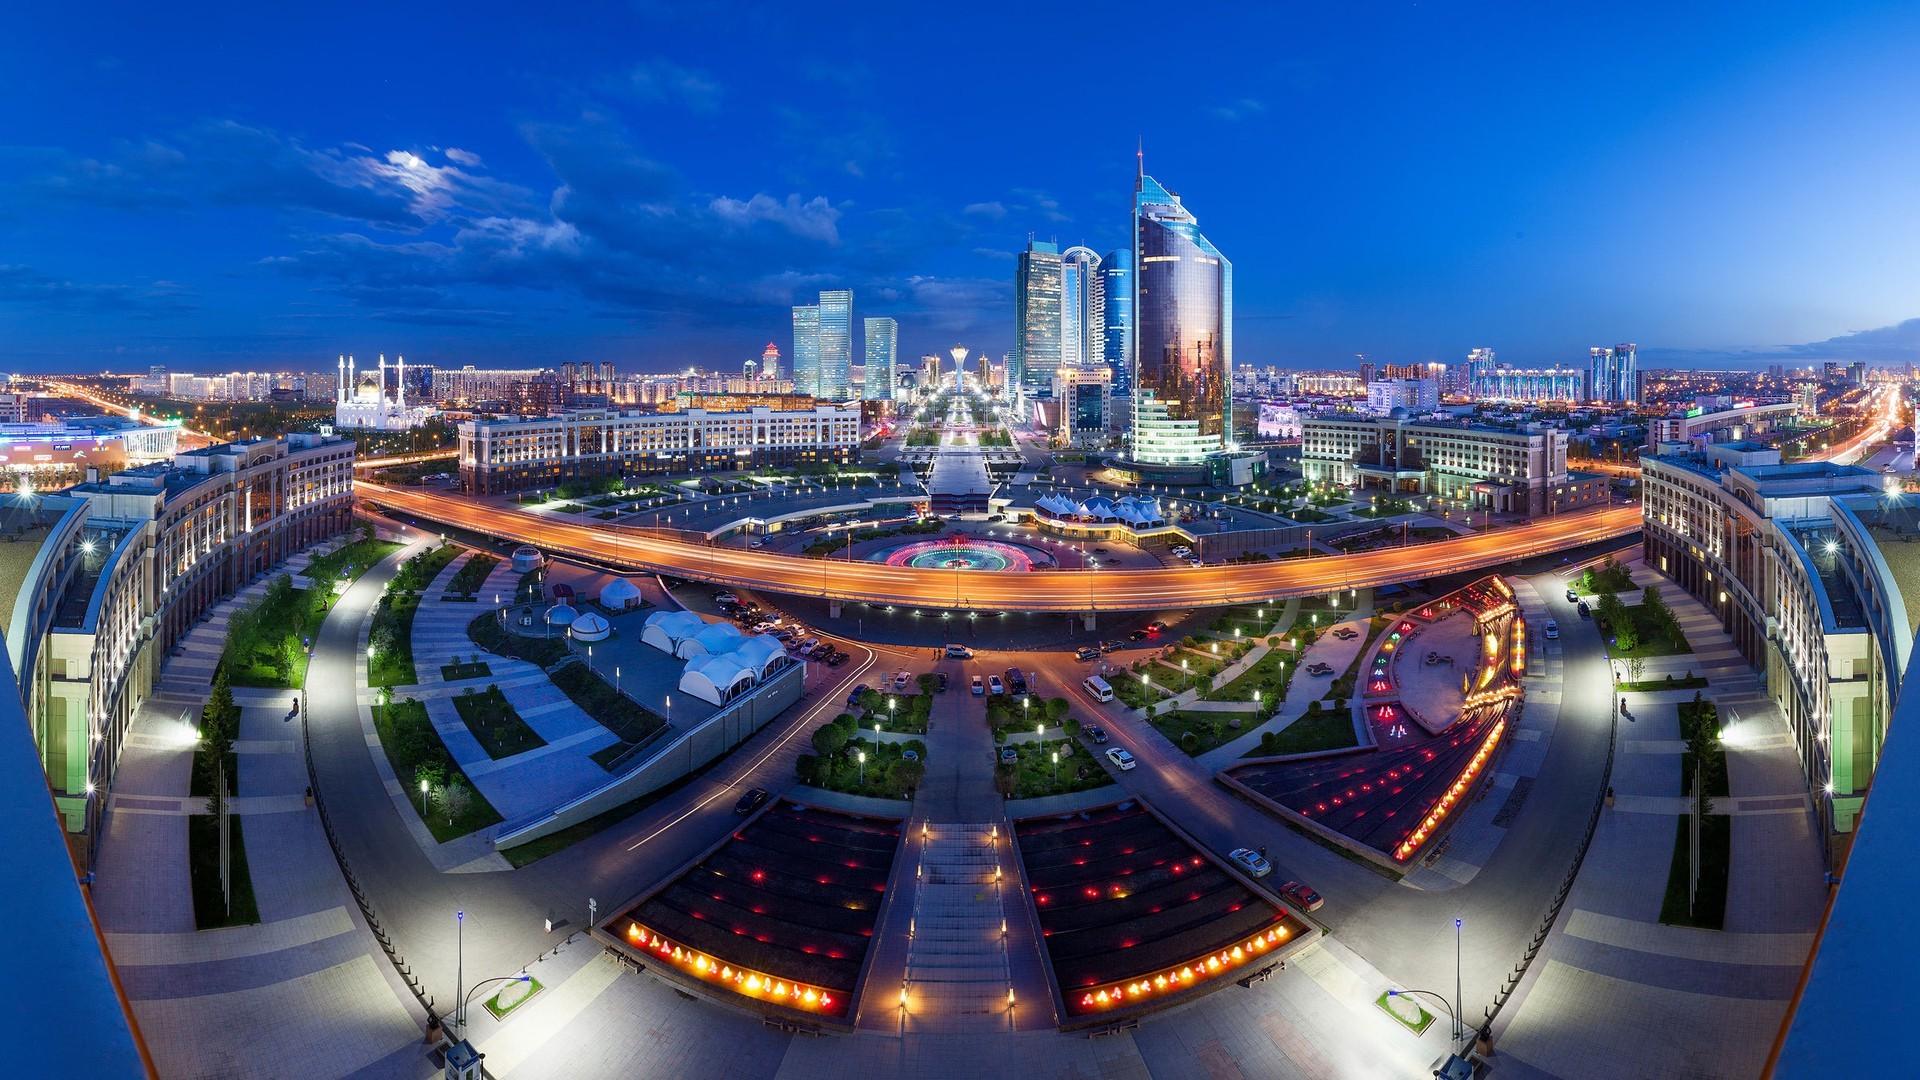 С днем независимости казахстана картинки на казахском после